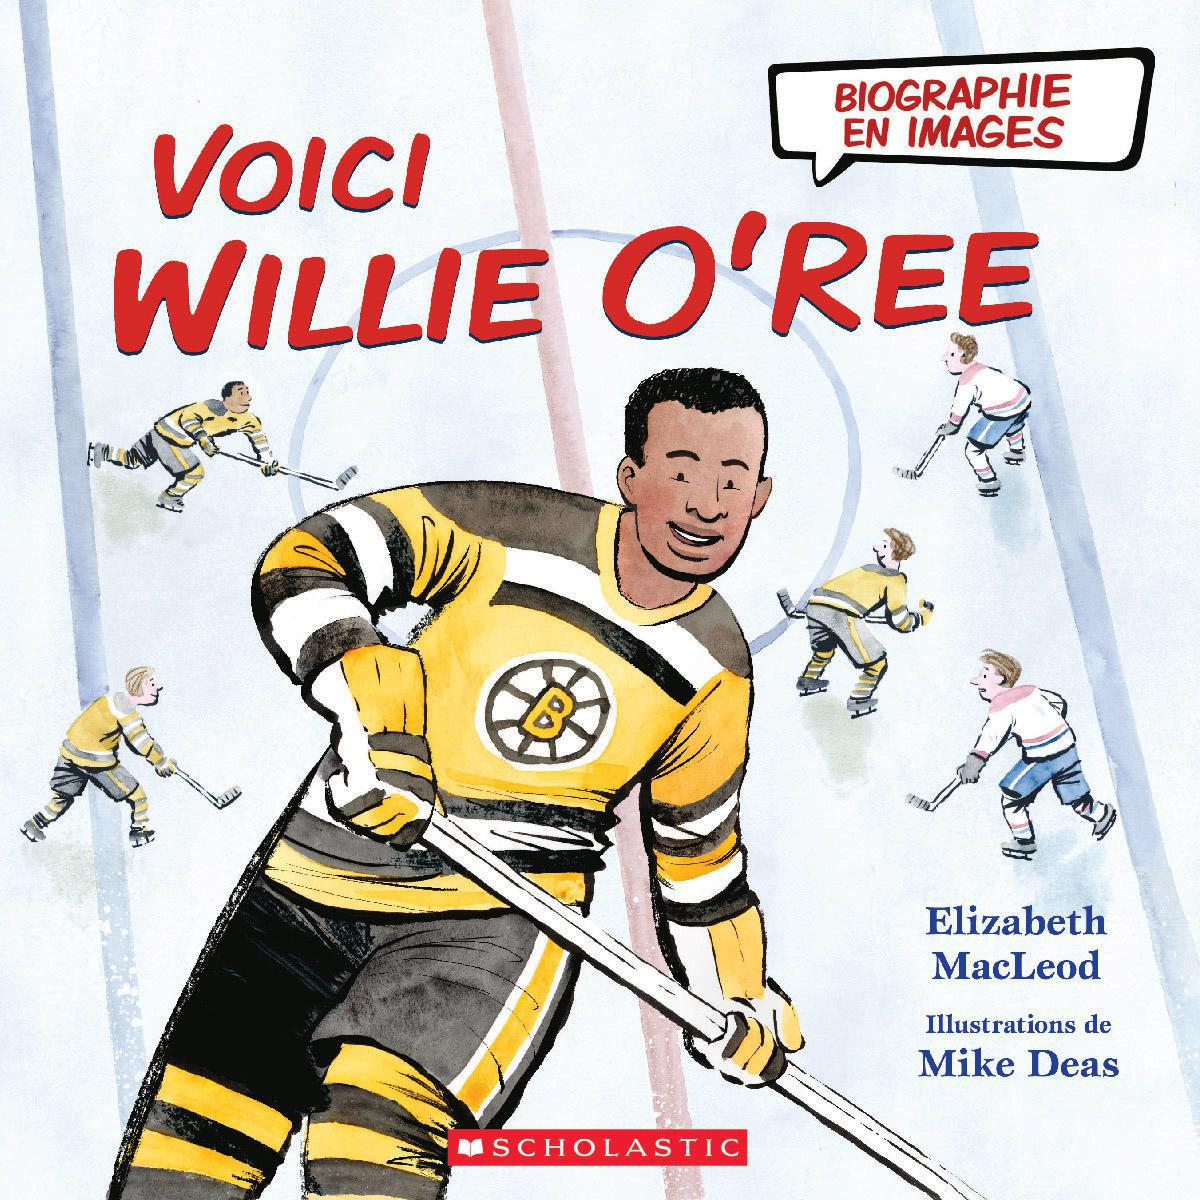 Biographie en images : Voici Willie O'Ree